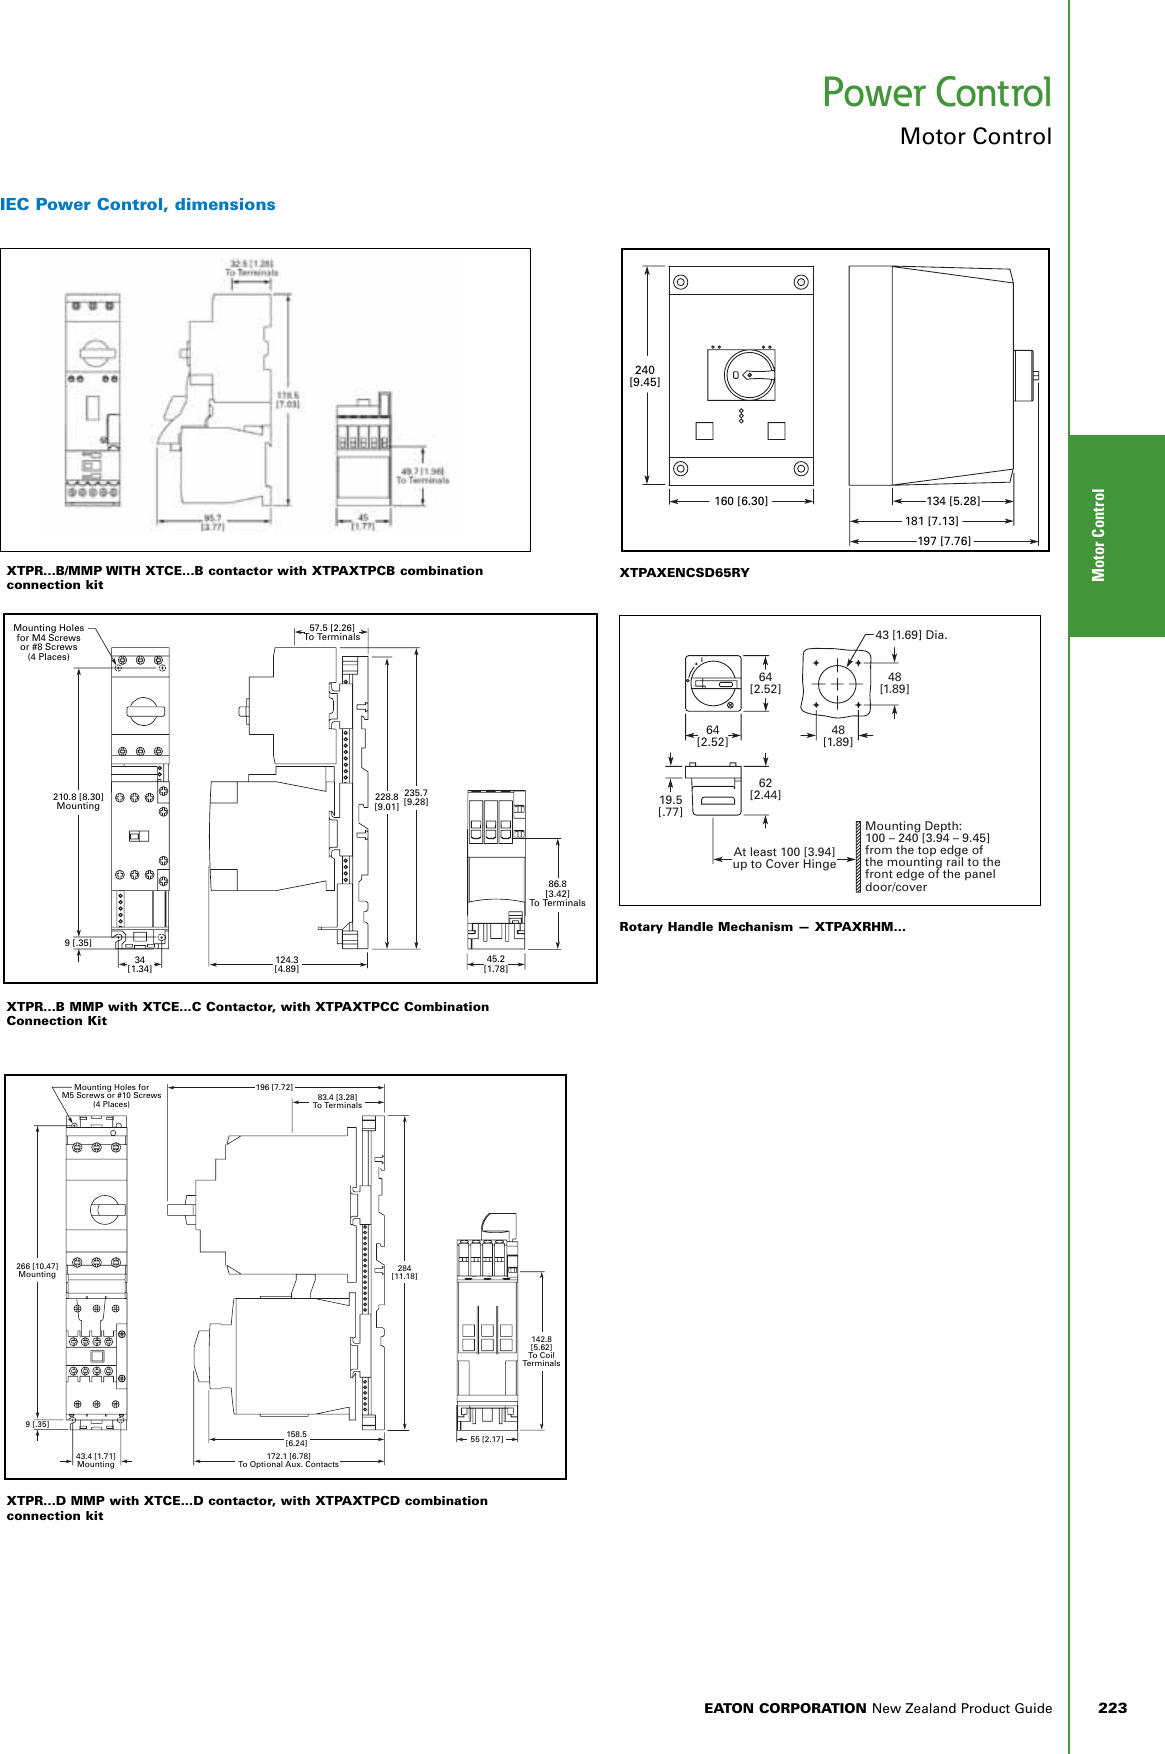 Vfd Control Wiring Diagram Besides Vfd Wiring Diagram Likewise Starter